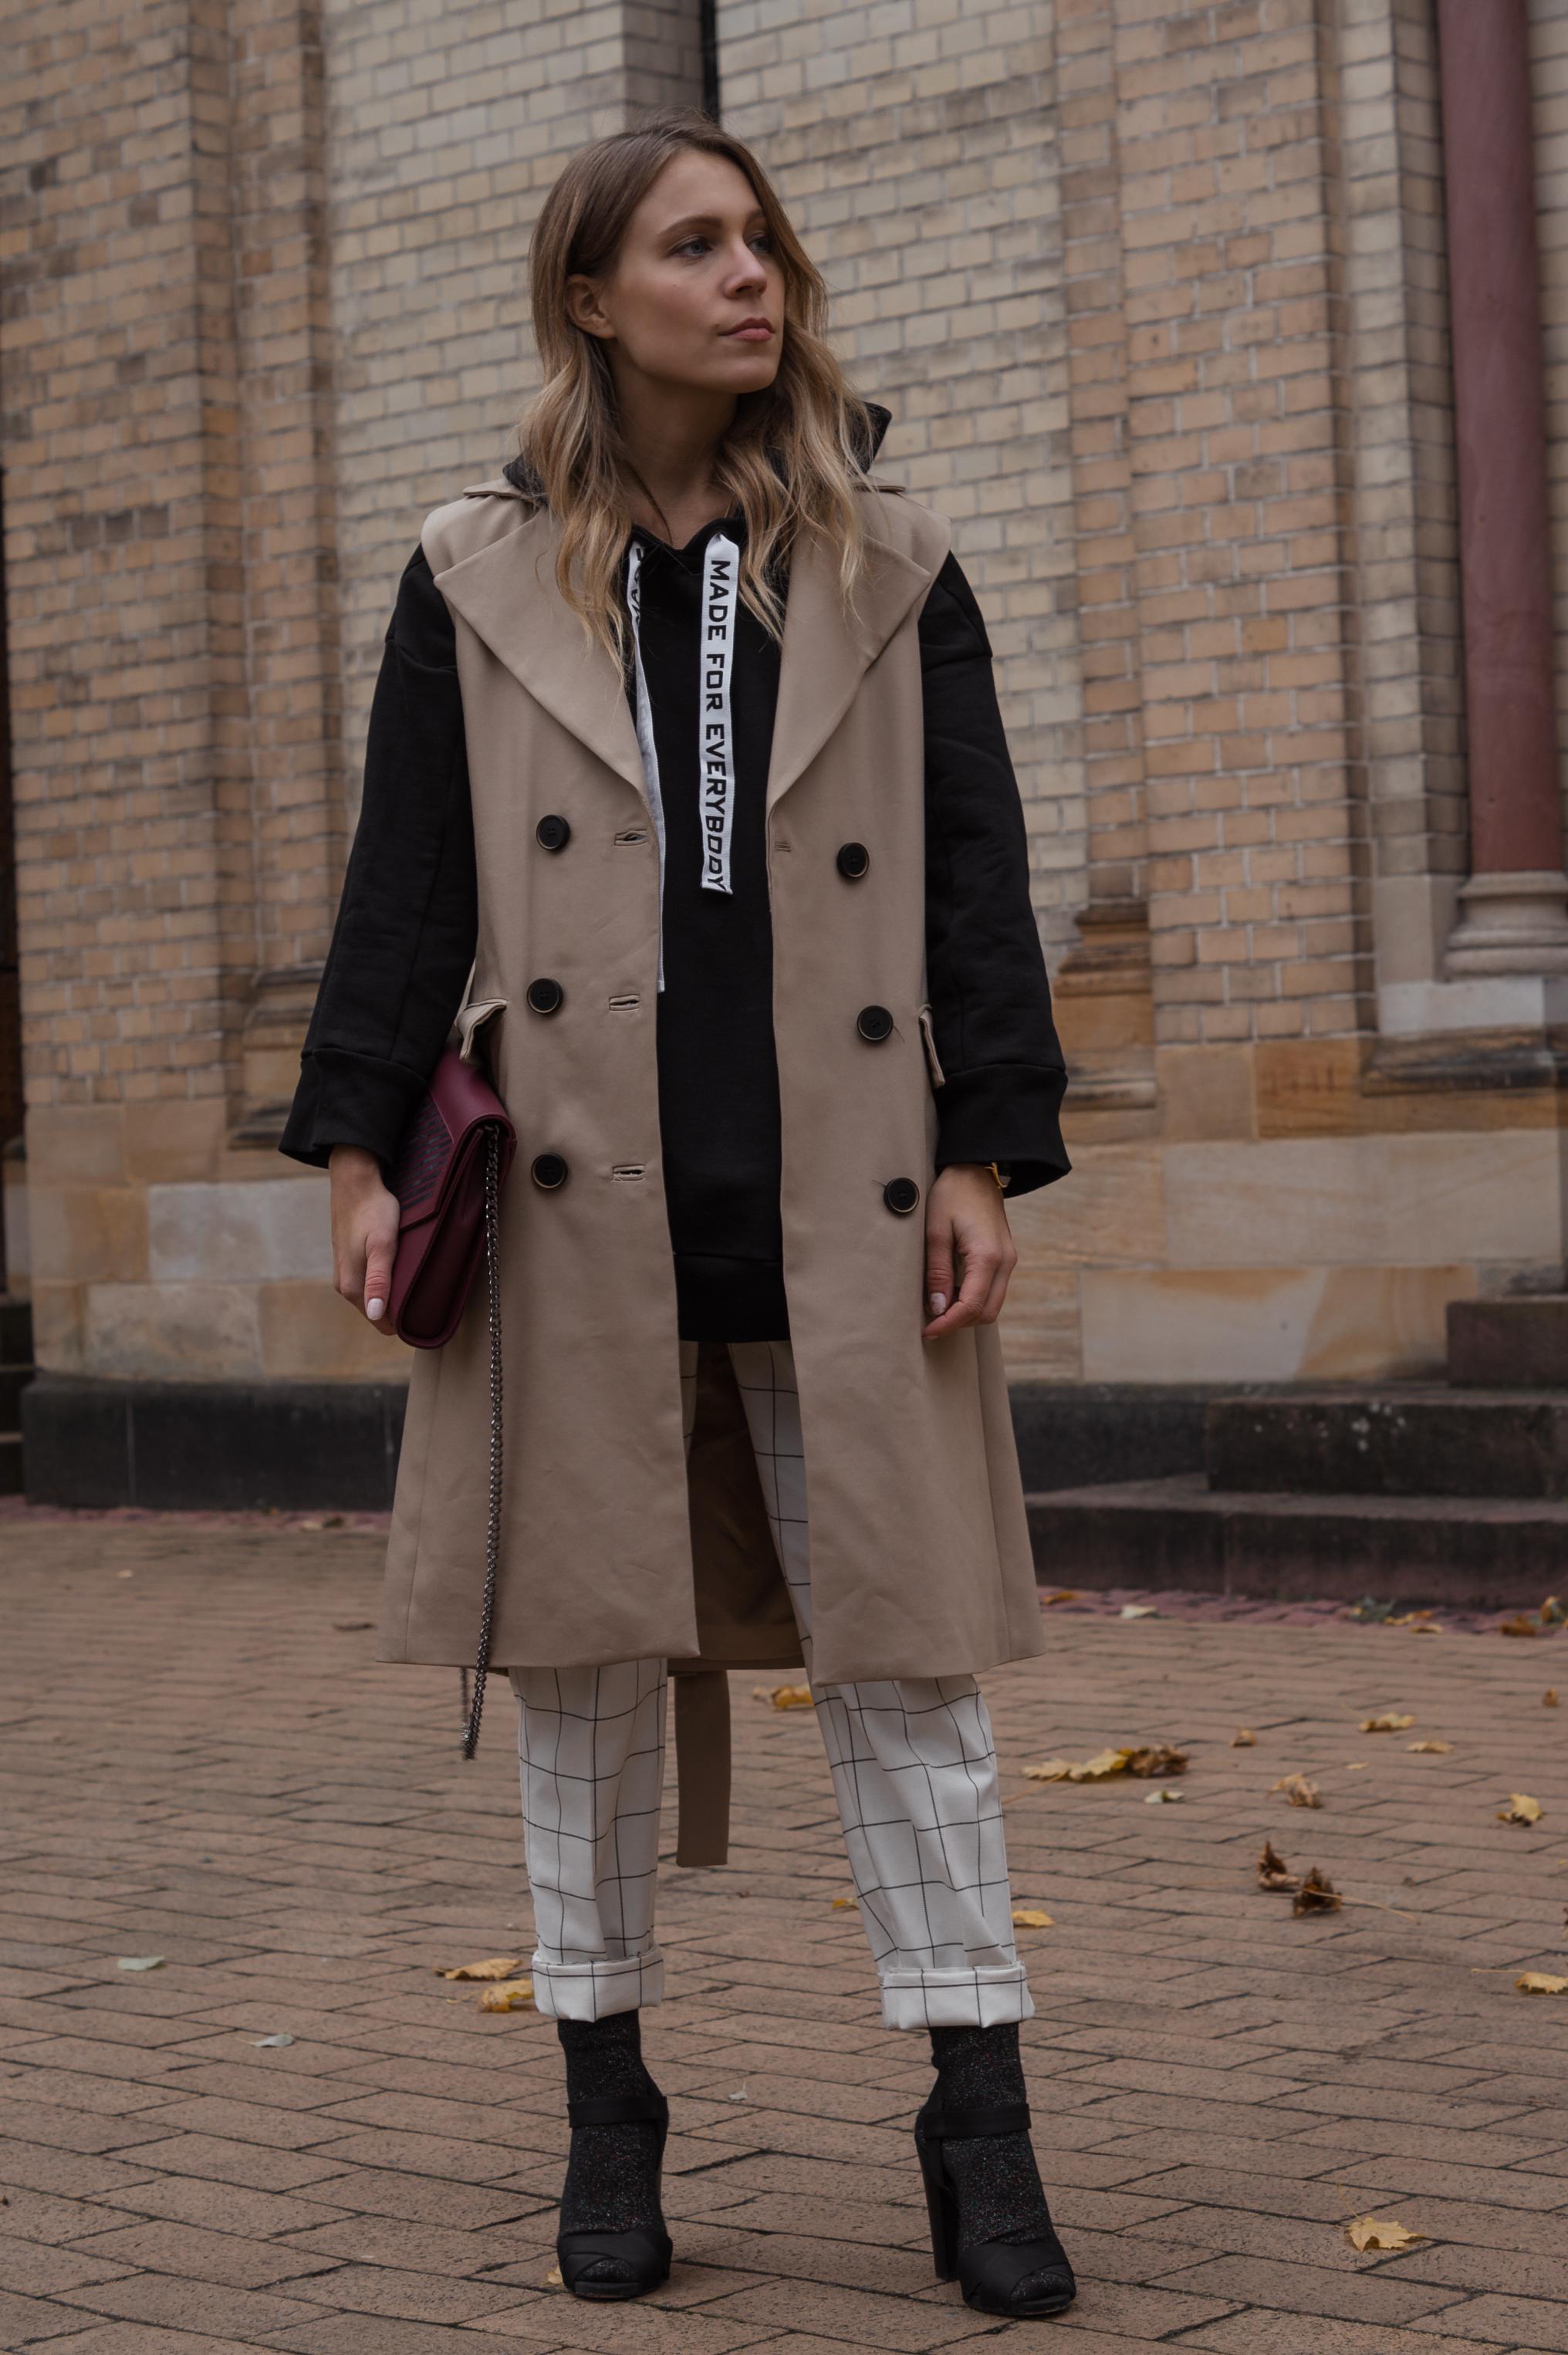 Zara Hoodie Trench Vest Lili Radu Bag Fashionblogger Sariety Modeblog Heidelberg Fall Layers karierte Hose Mango Streetstyle_8